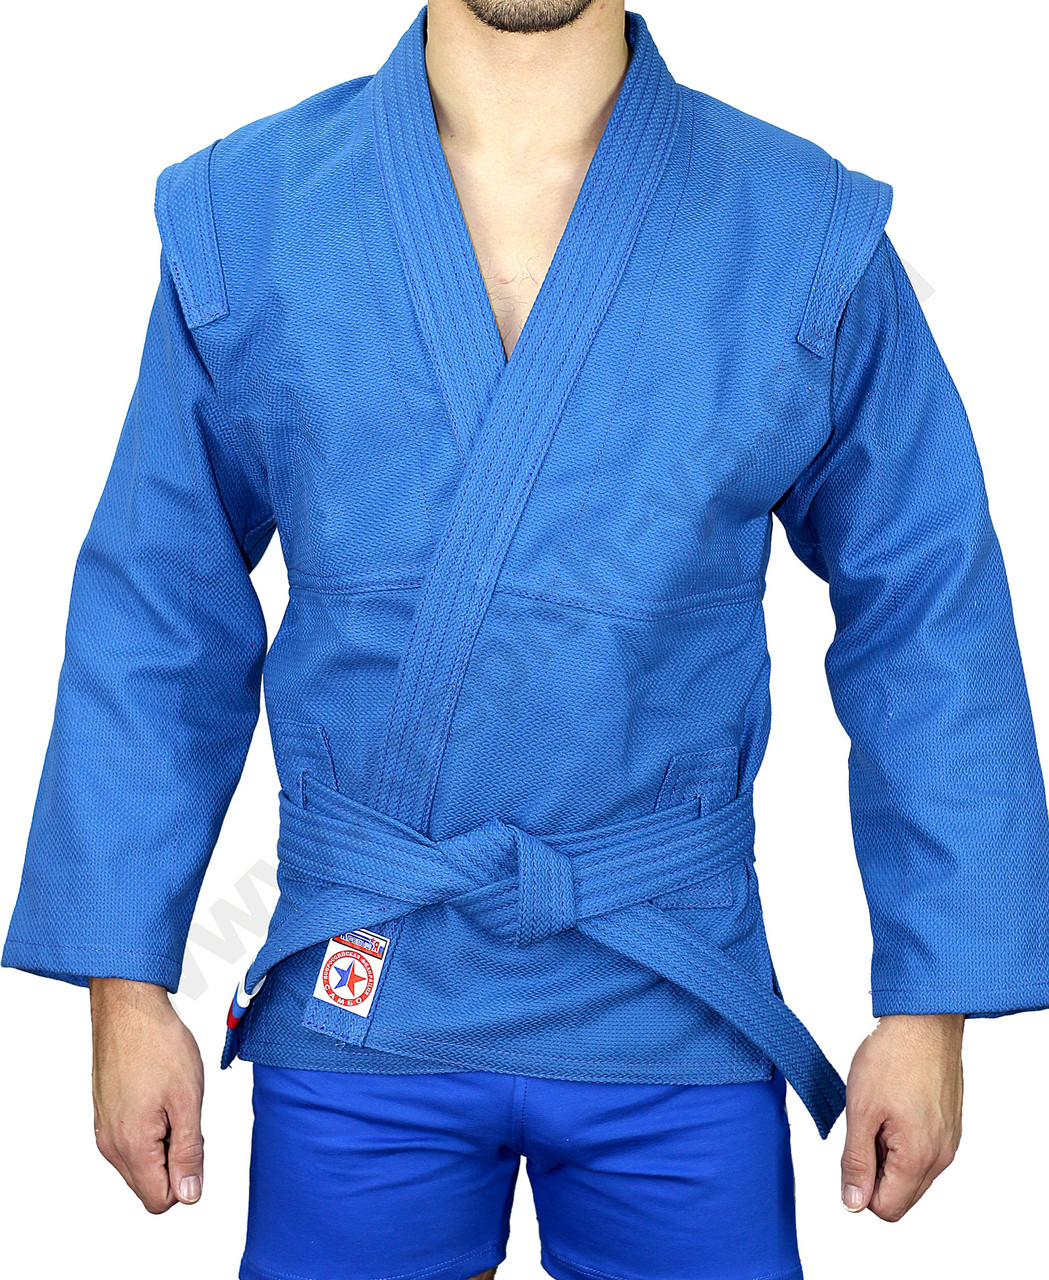 Кимоно самбо синий